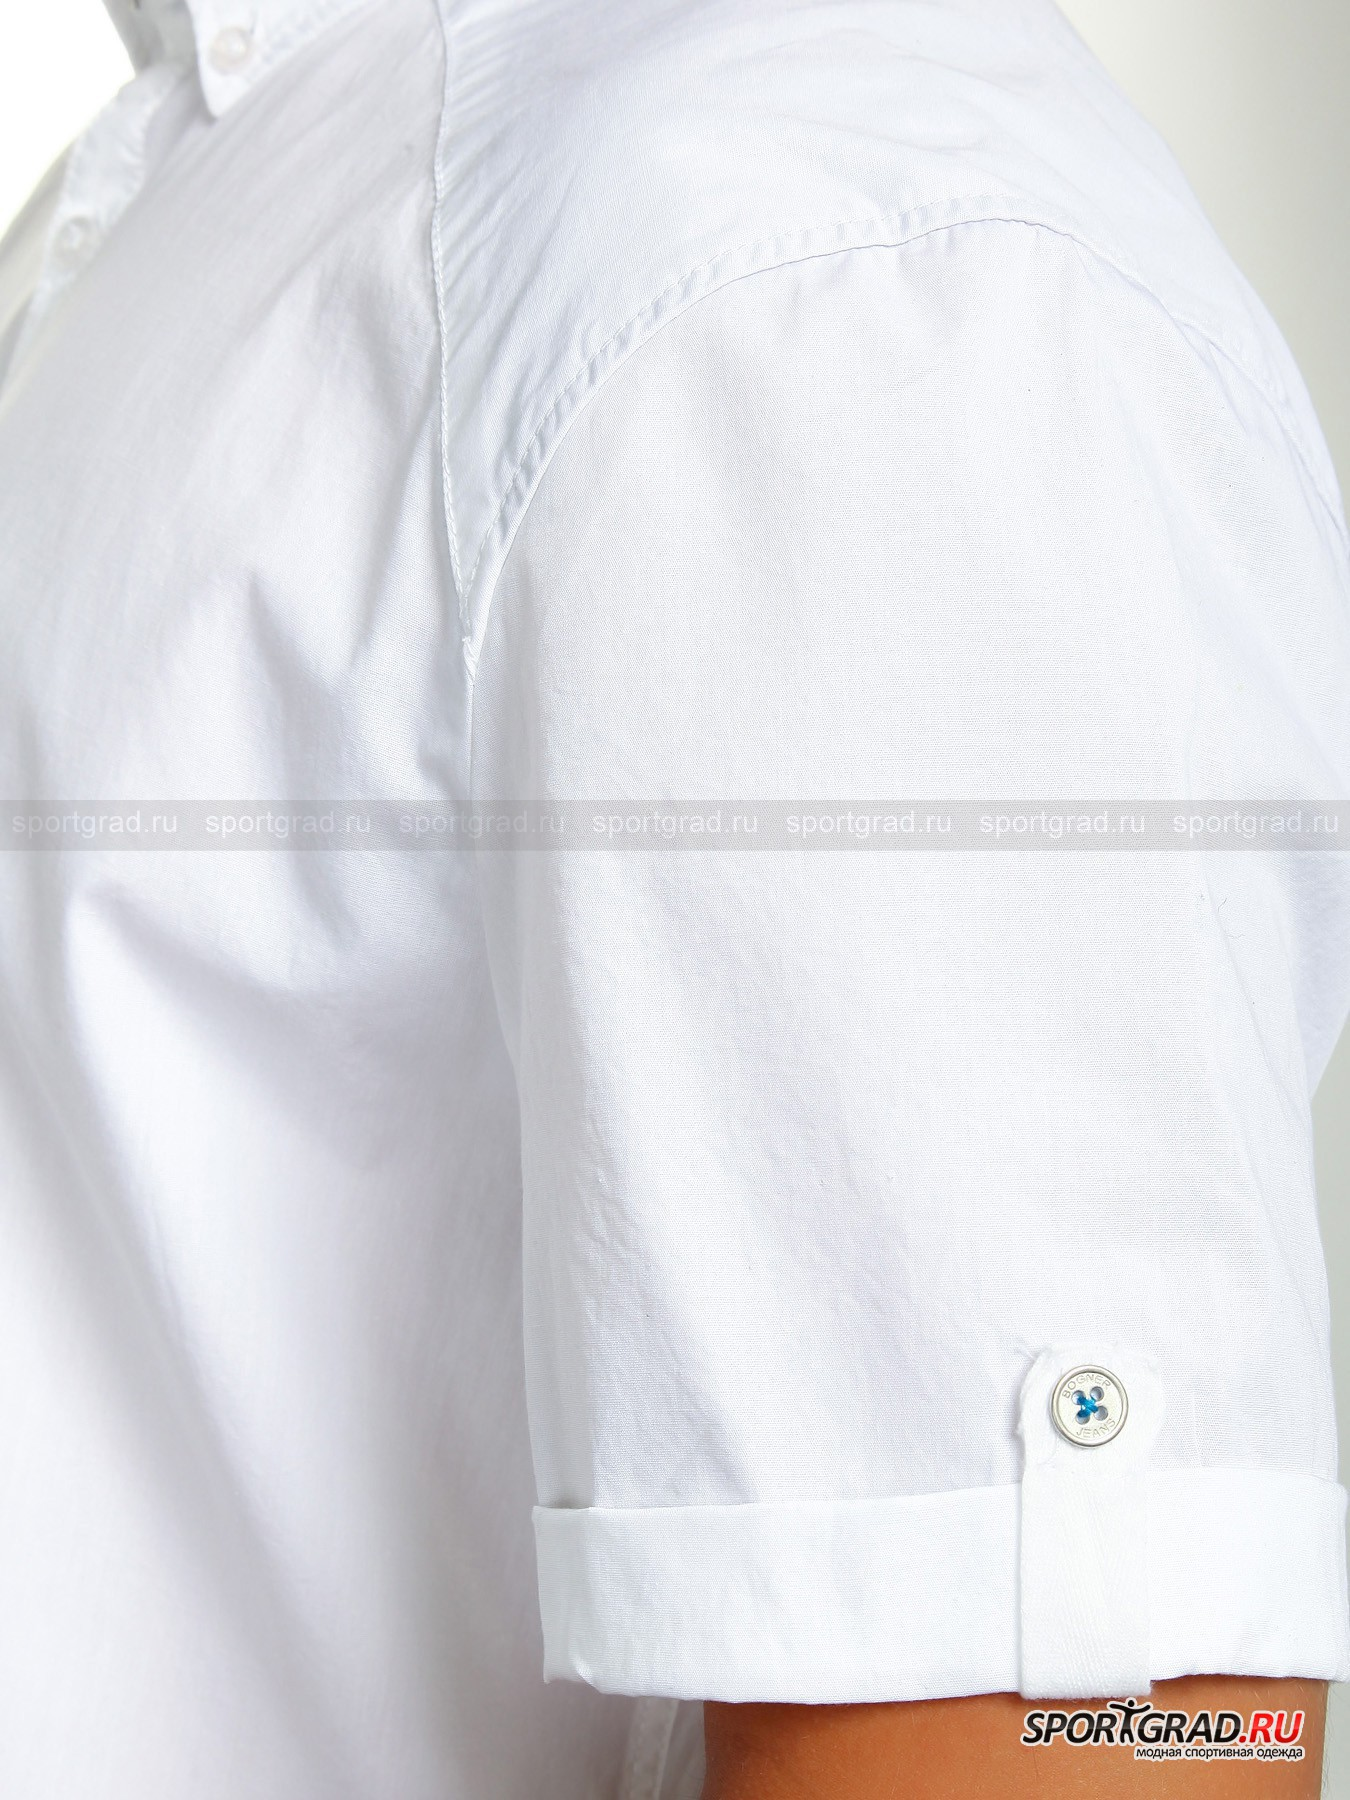 Рубашка мужская WASHED LINEN BOGNER JEANS от Спортград